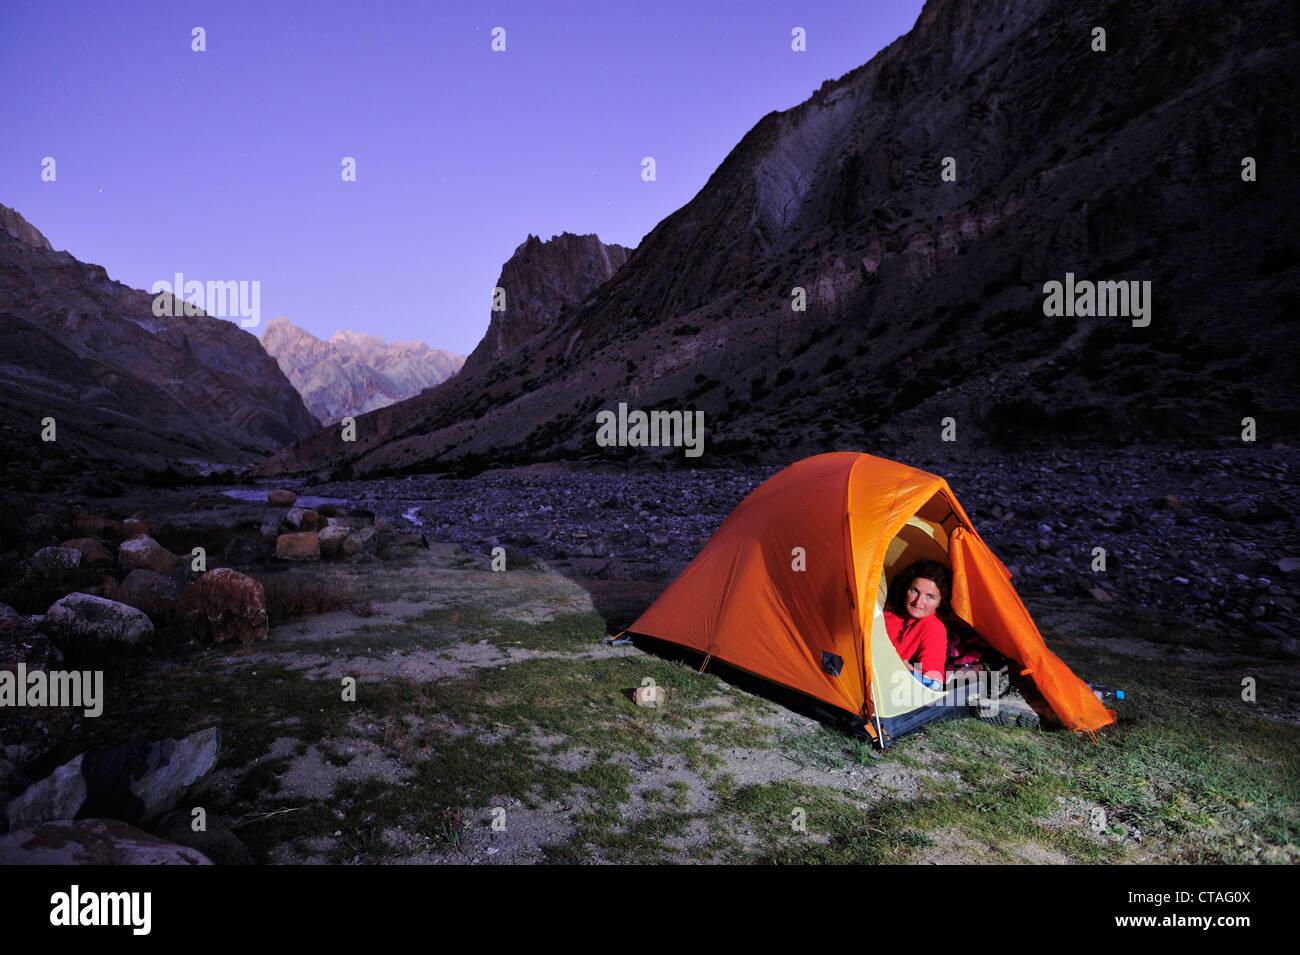 Woman lying in a tent, Honupatta, Zanskar Range Traverse, Zanskar Range, Zanskar, Ladakh, Jammu and Kashmir, India - Stock Image